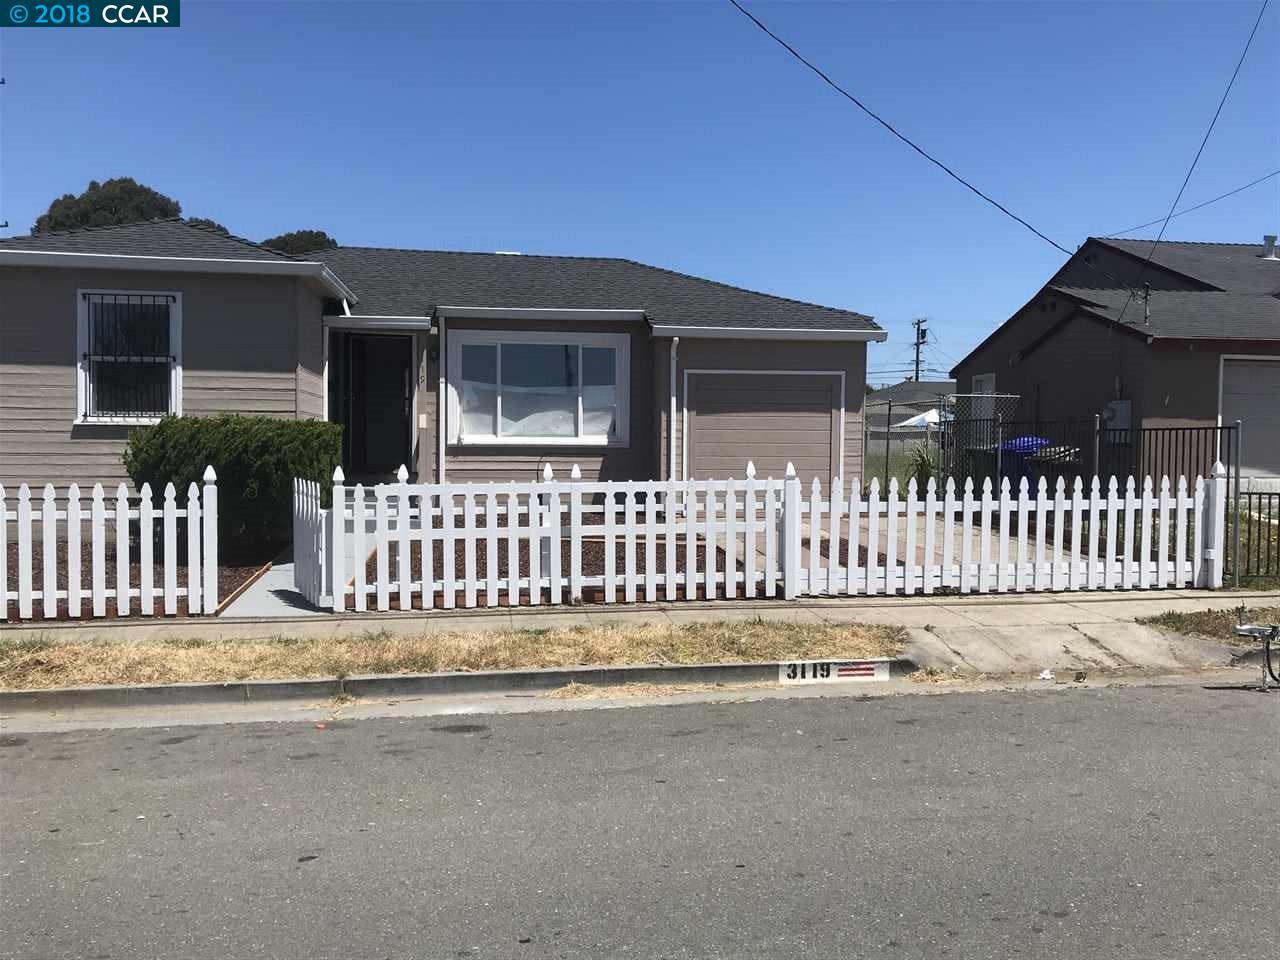 3119 CENTER AVE, RICHMOND, CA 94804